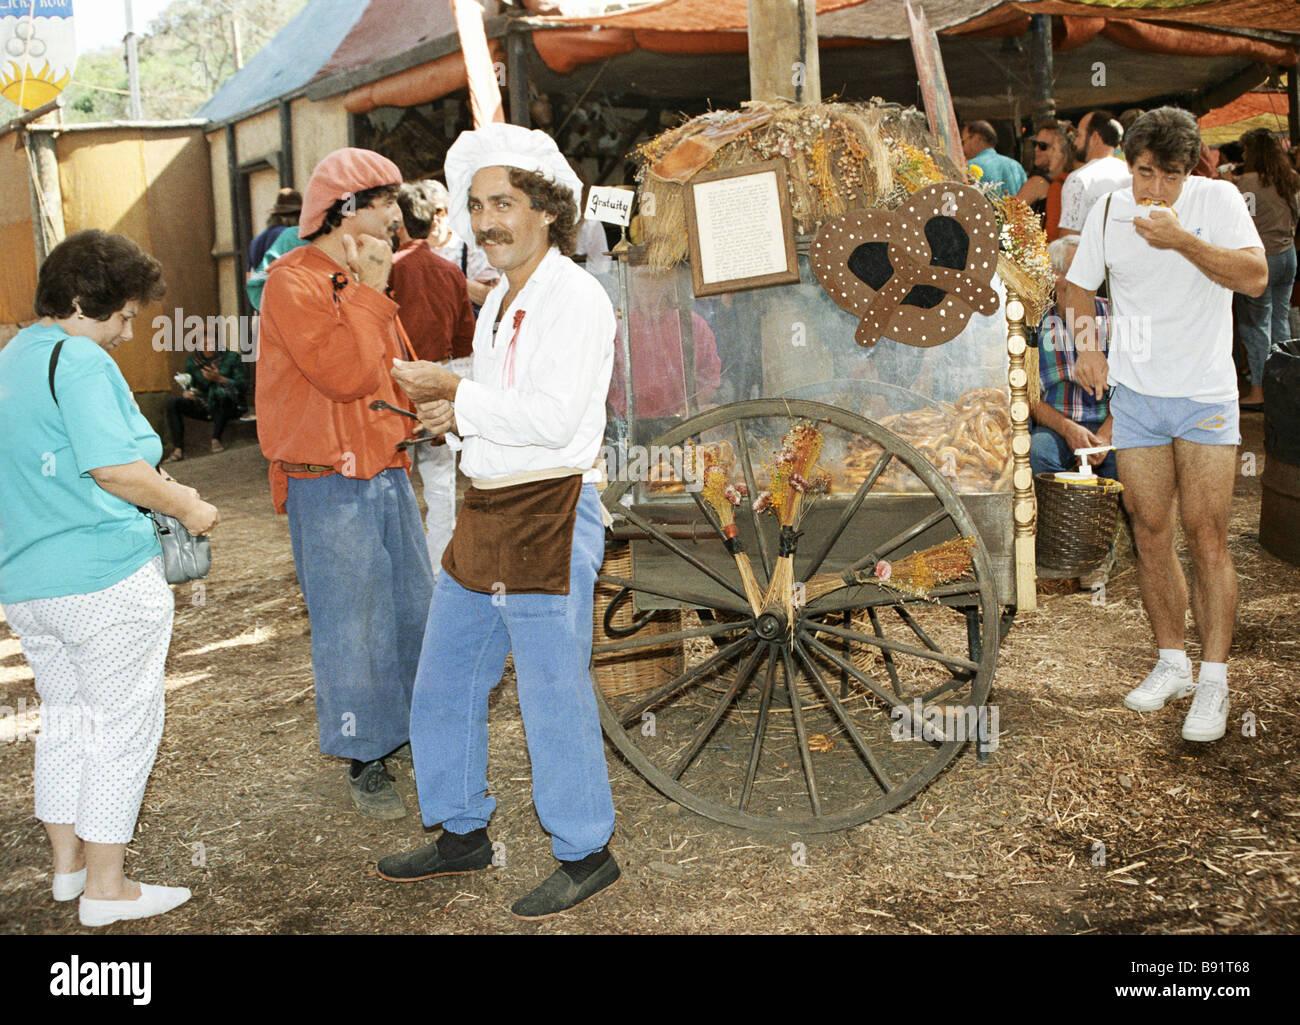 Vendedores de caliente en el Renaissance boubliks placer justo San Francisco Imagen De Stock